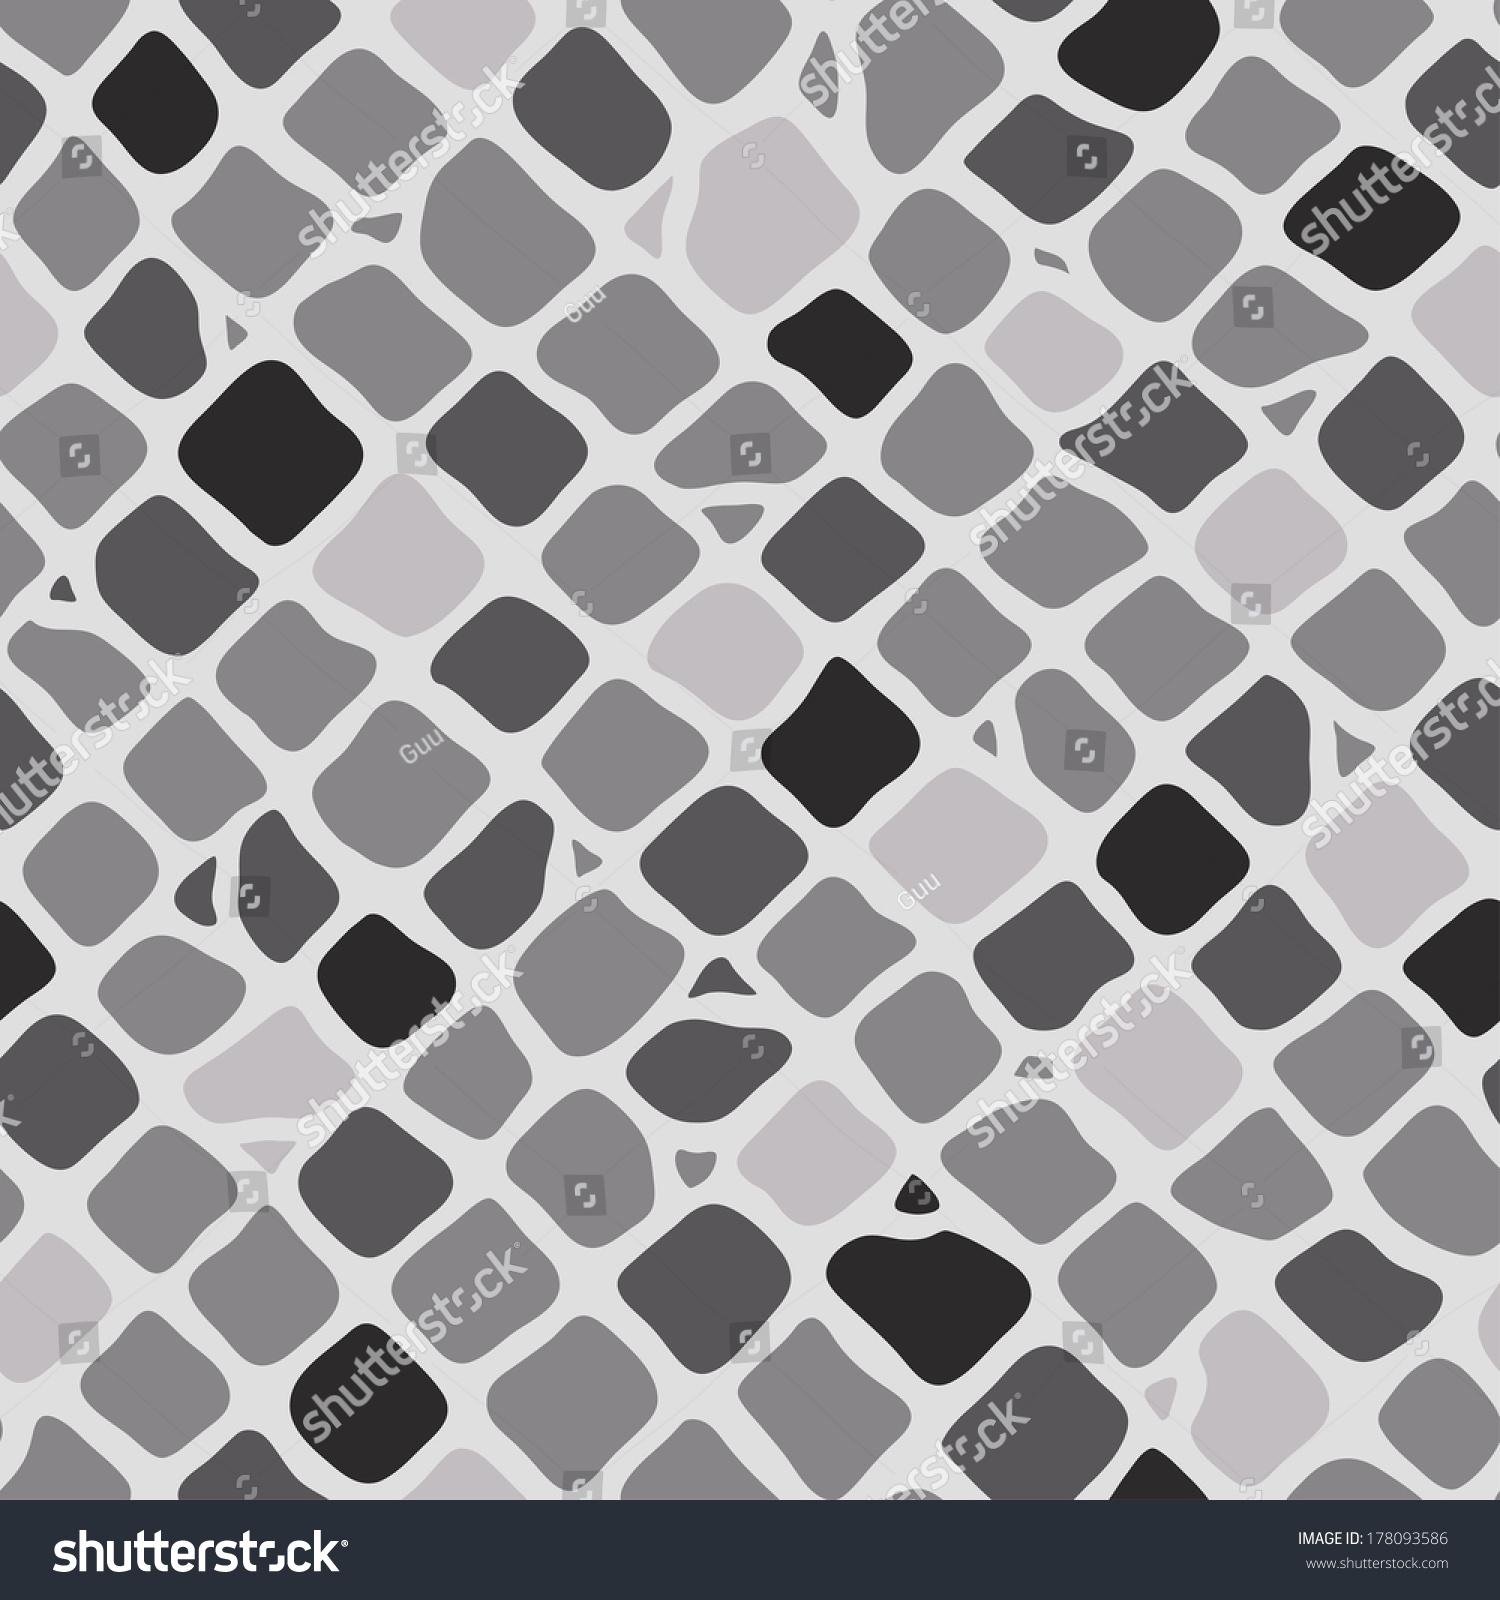 Ative Shower Panels - Cintinel.com